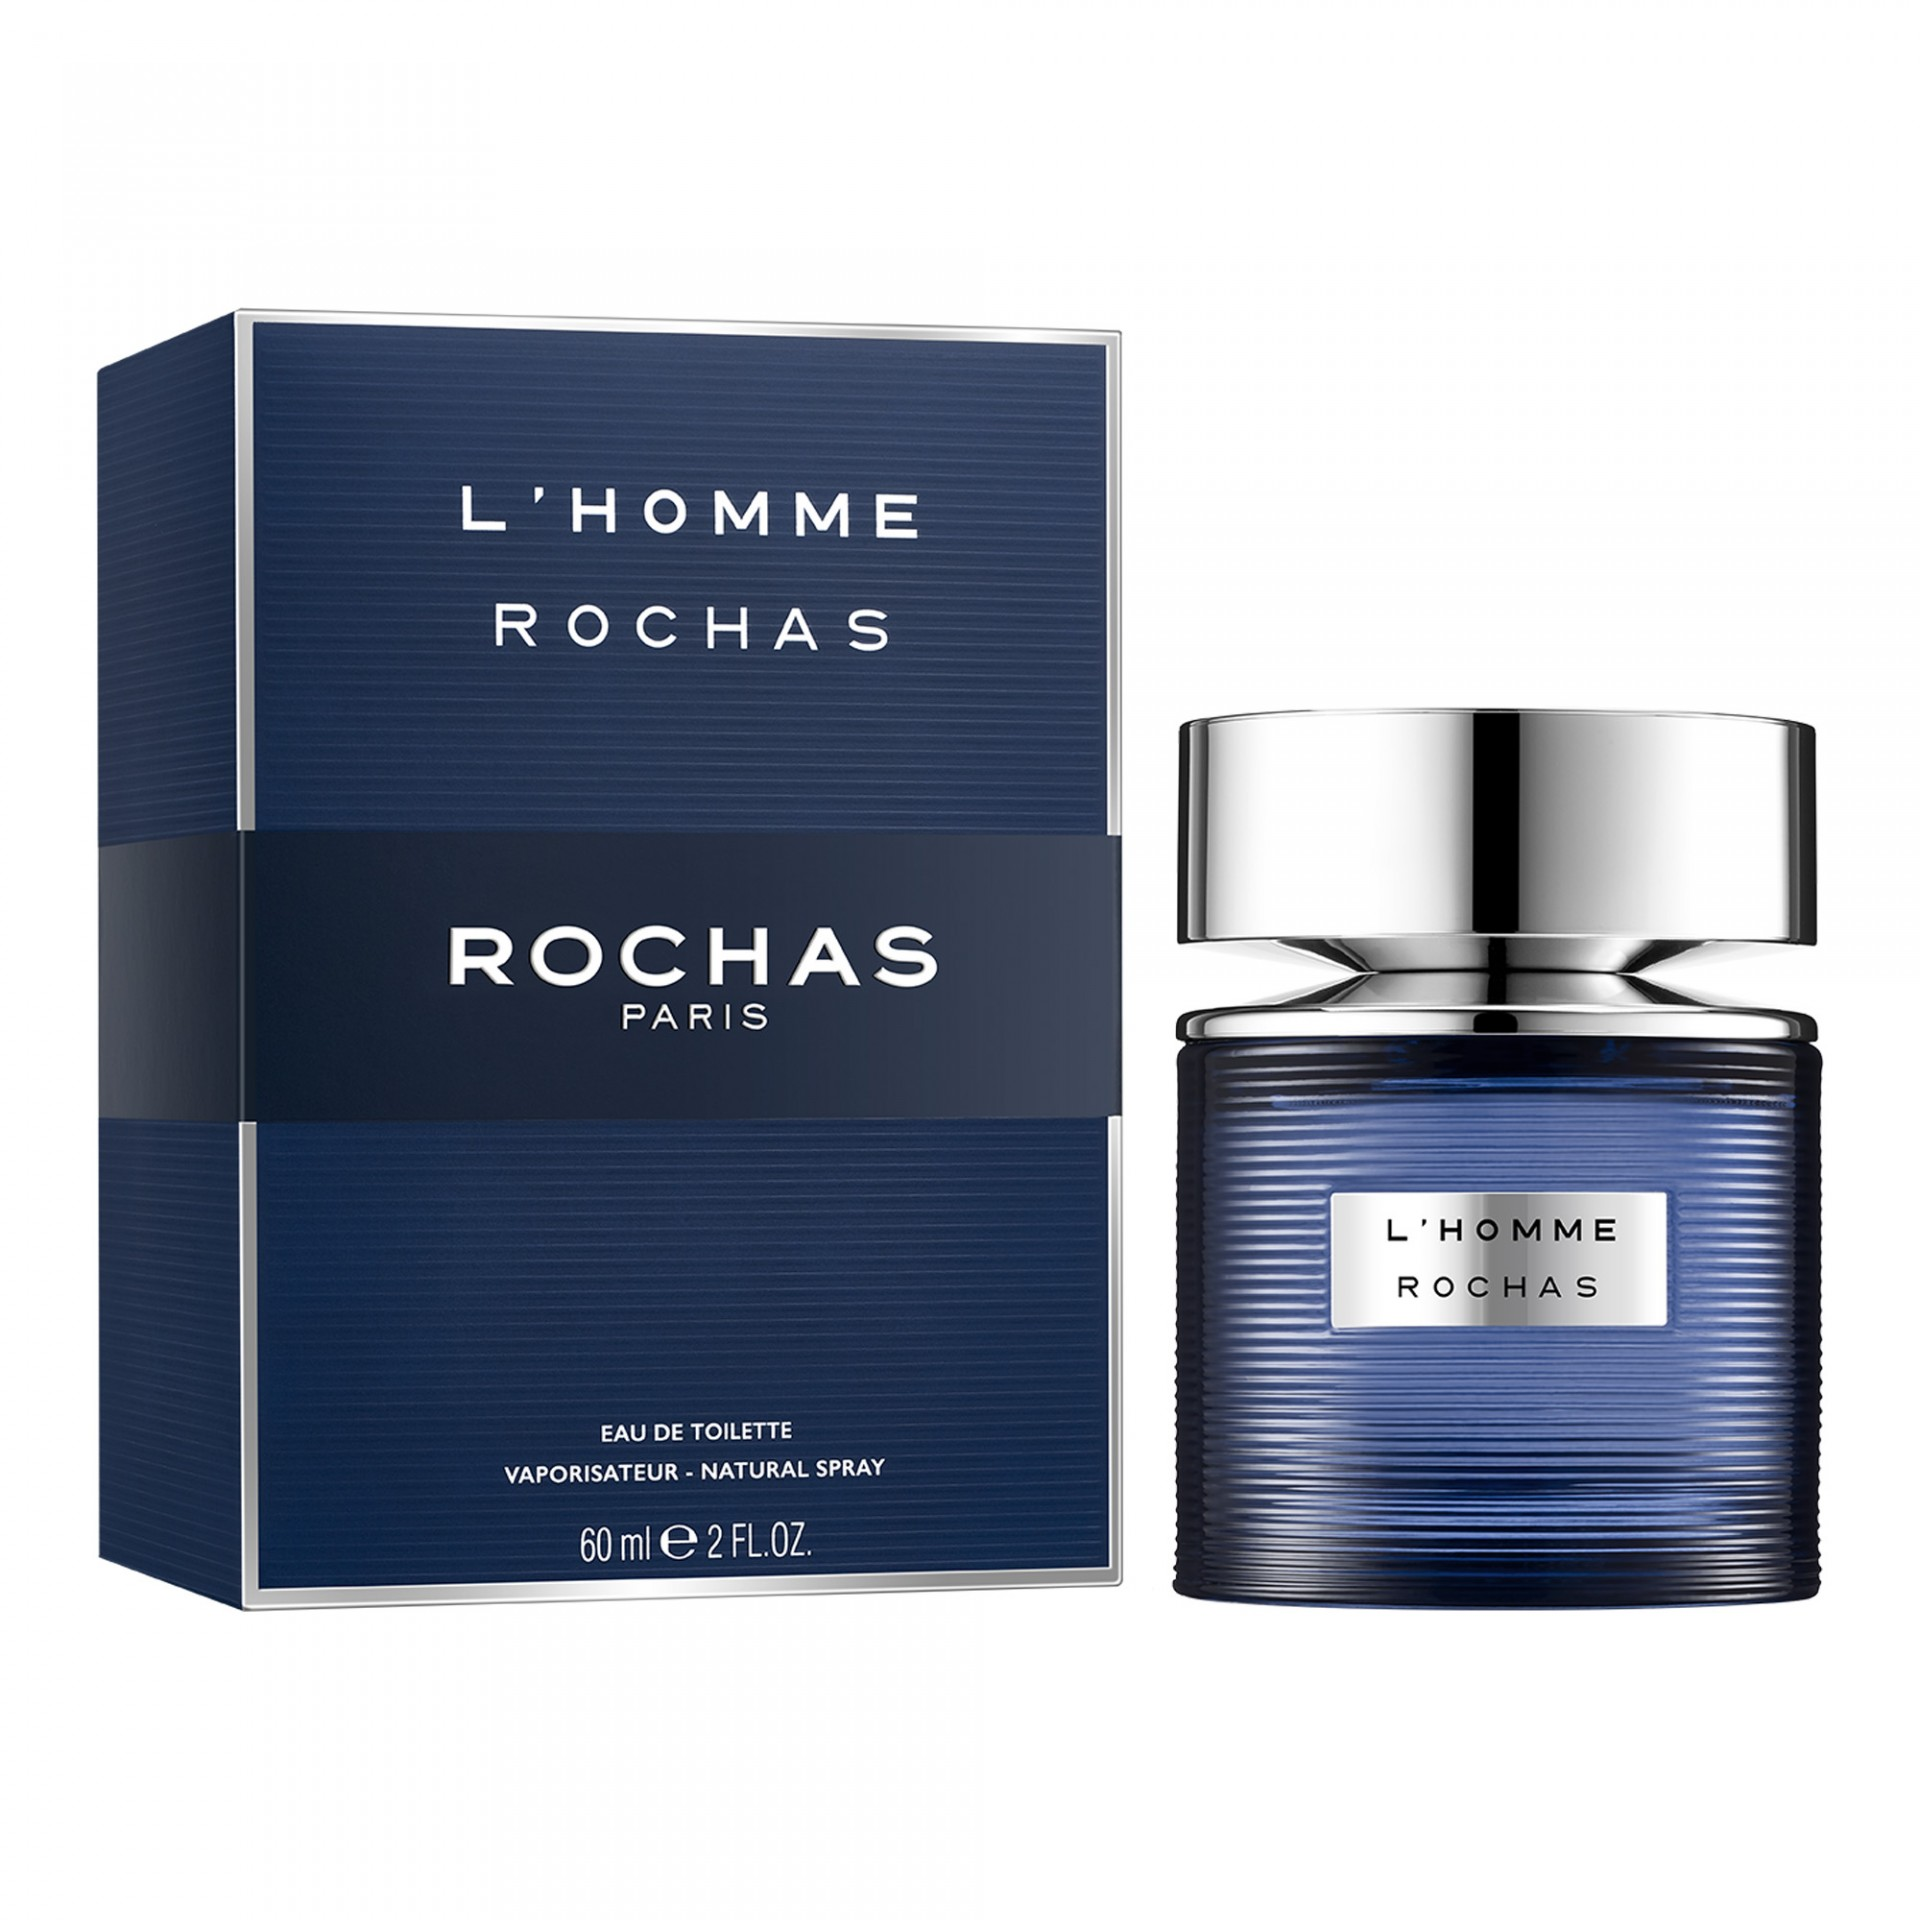 Rochas - L'Homme Rochas - eau de toilette